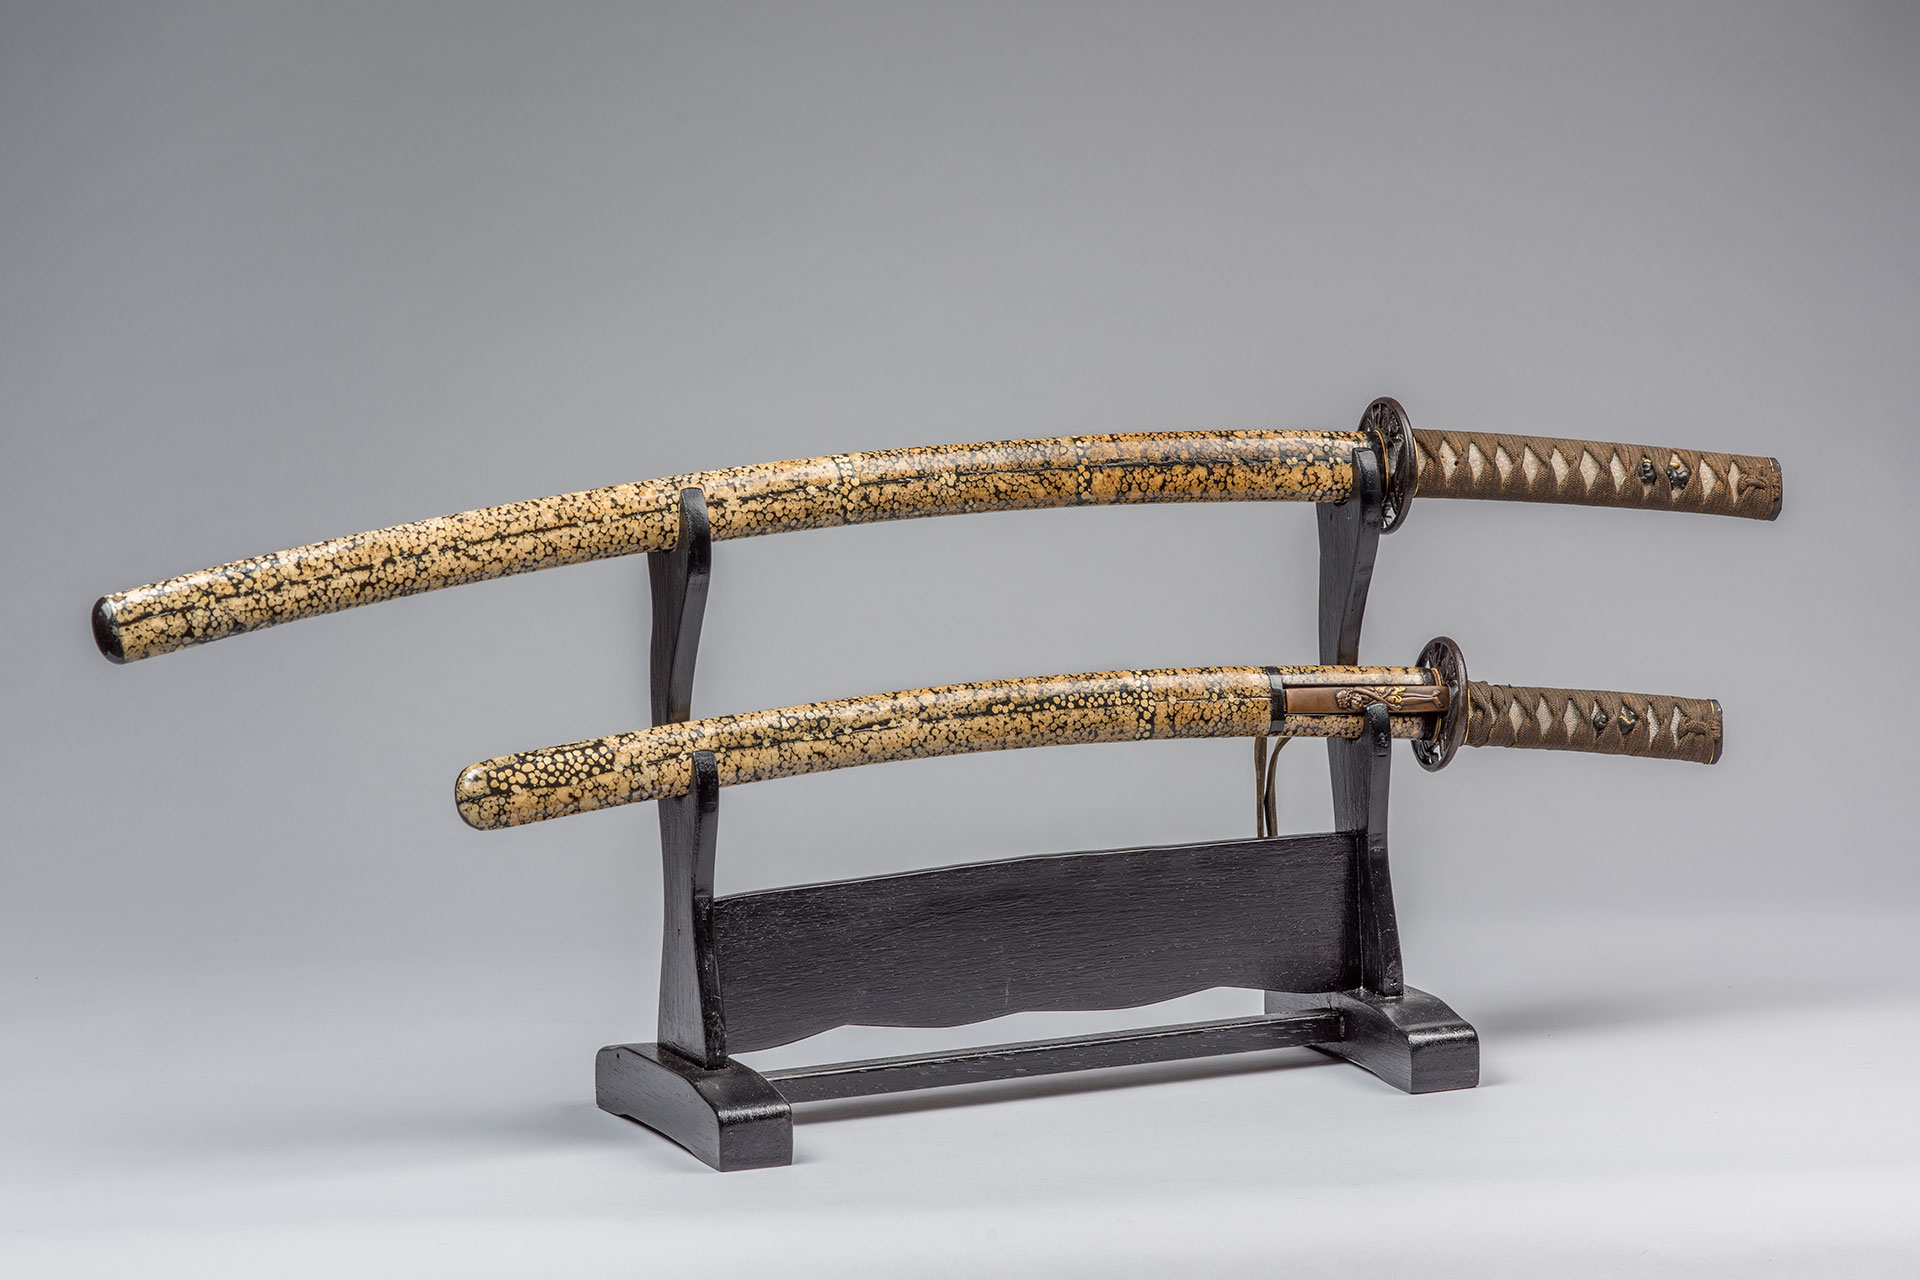 Catanas japonesas esmaltadas (1780-1790 DC)